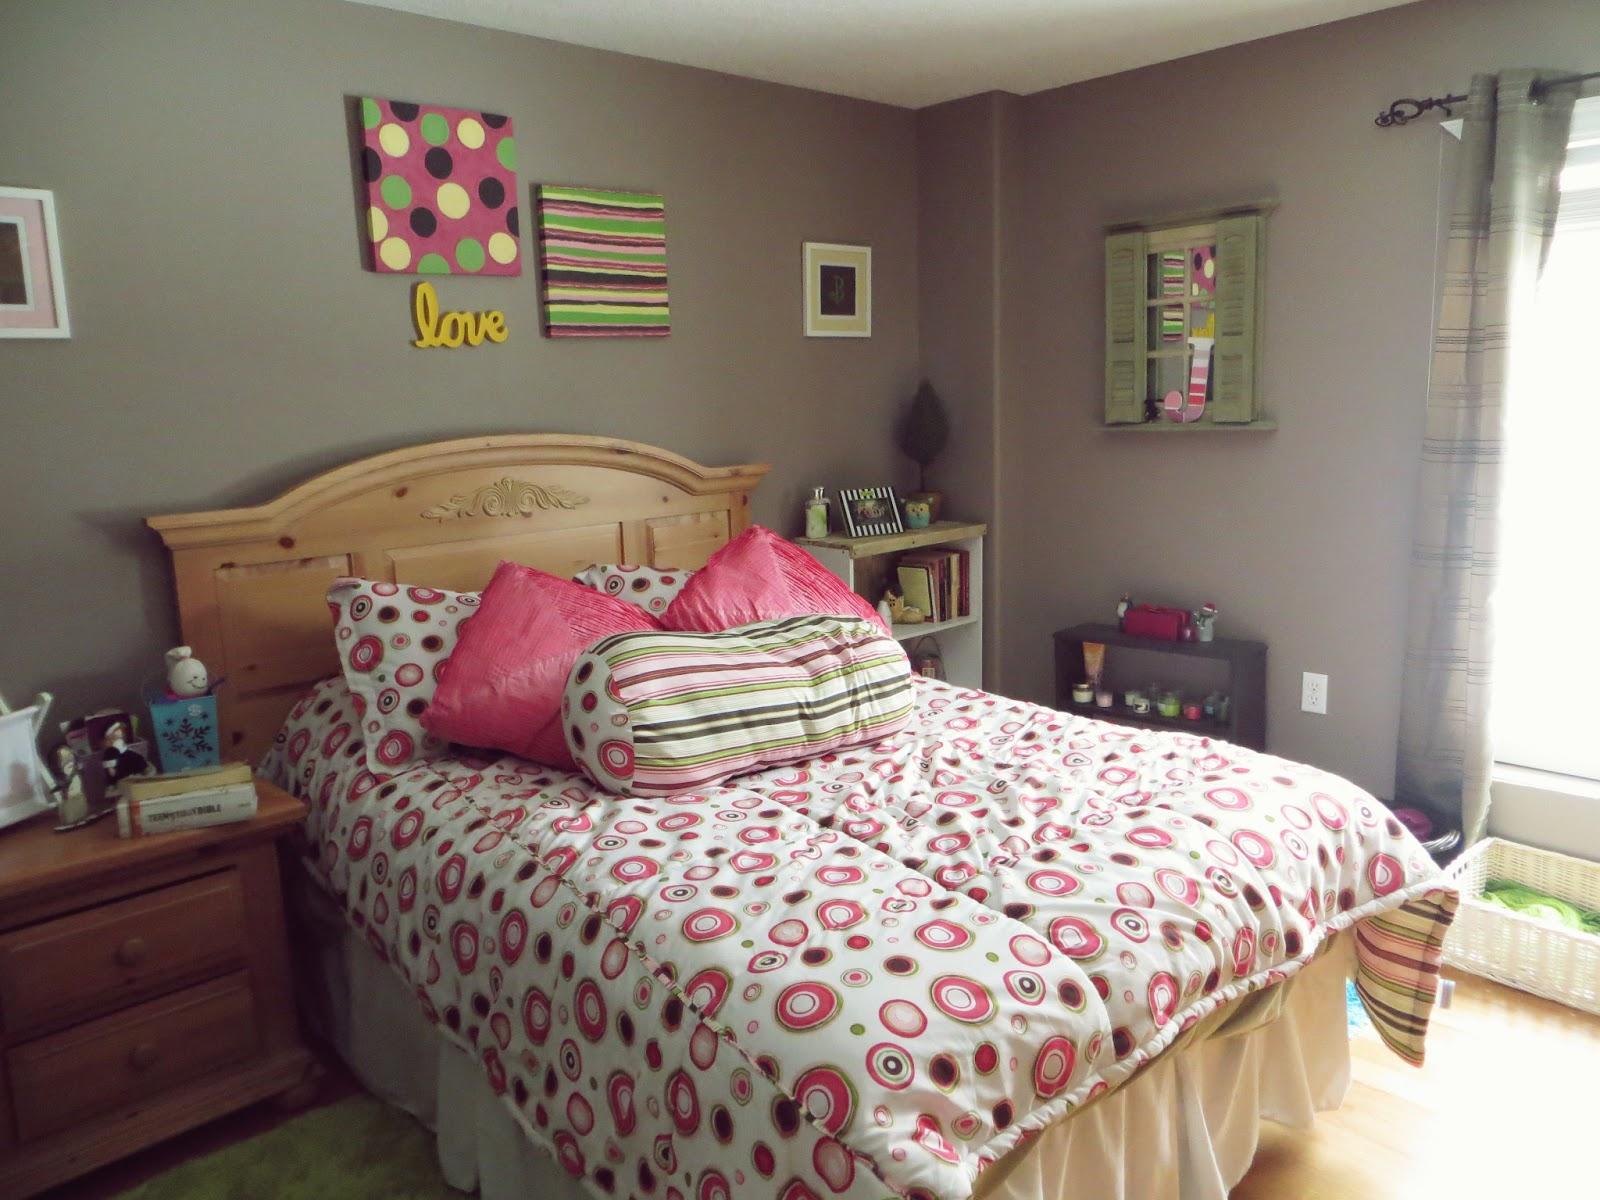 Namely Original: DIY Bookshelf Upcycle on Teenager:_L_Breseofm= Bedroom Ideas  id=78041